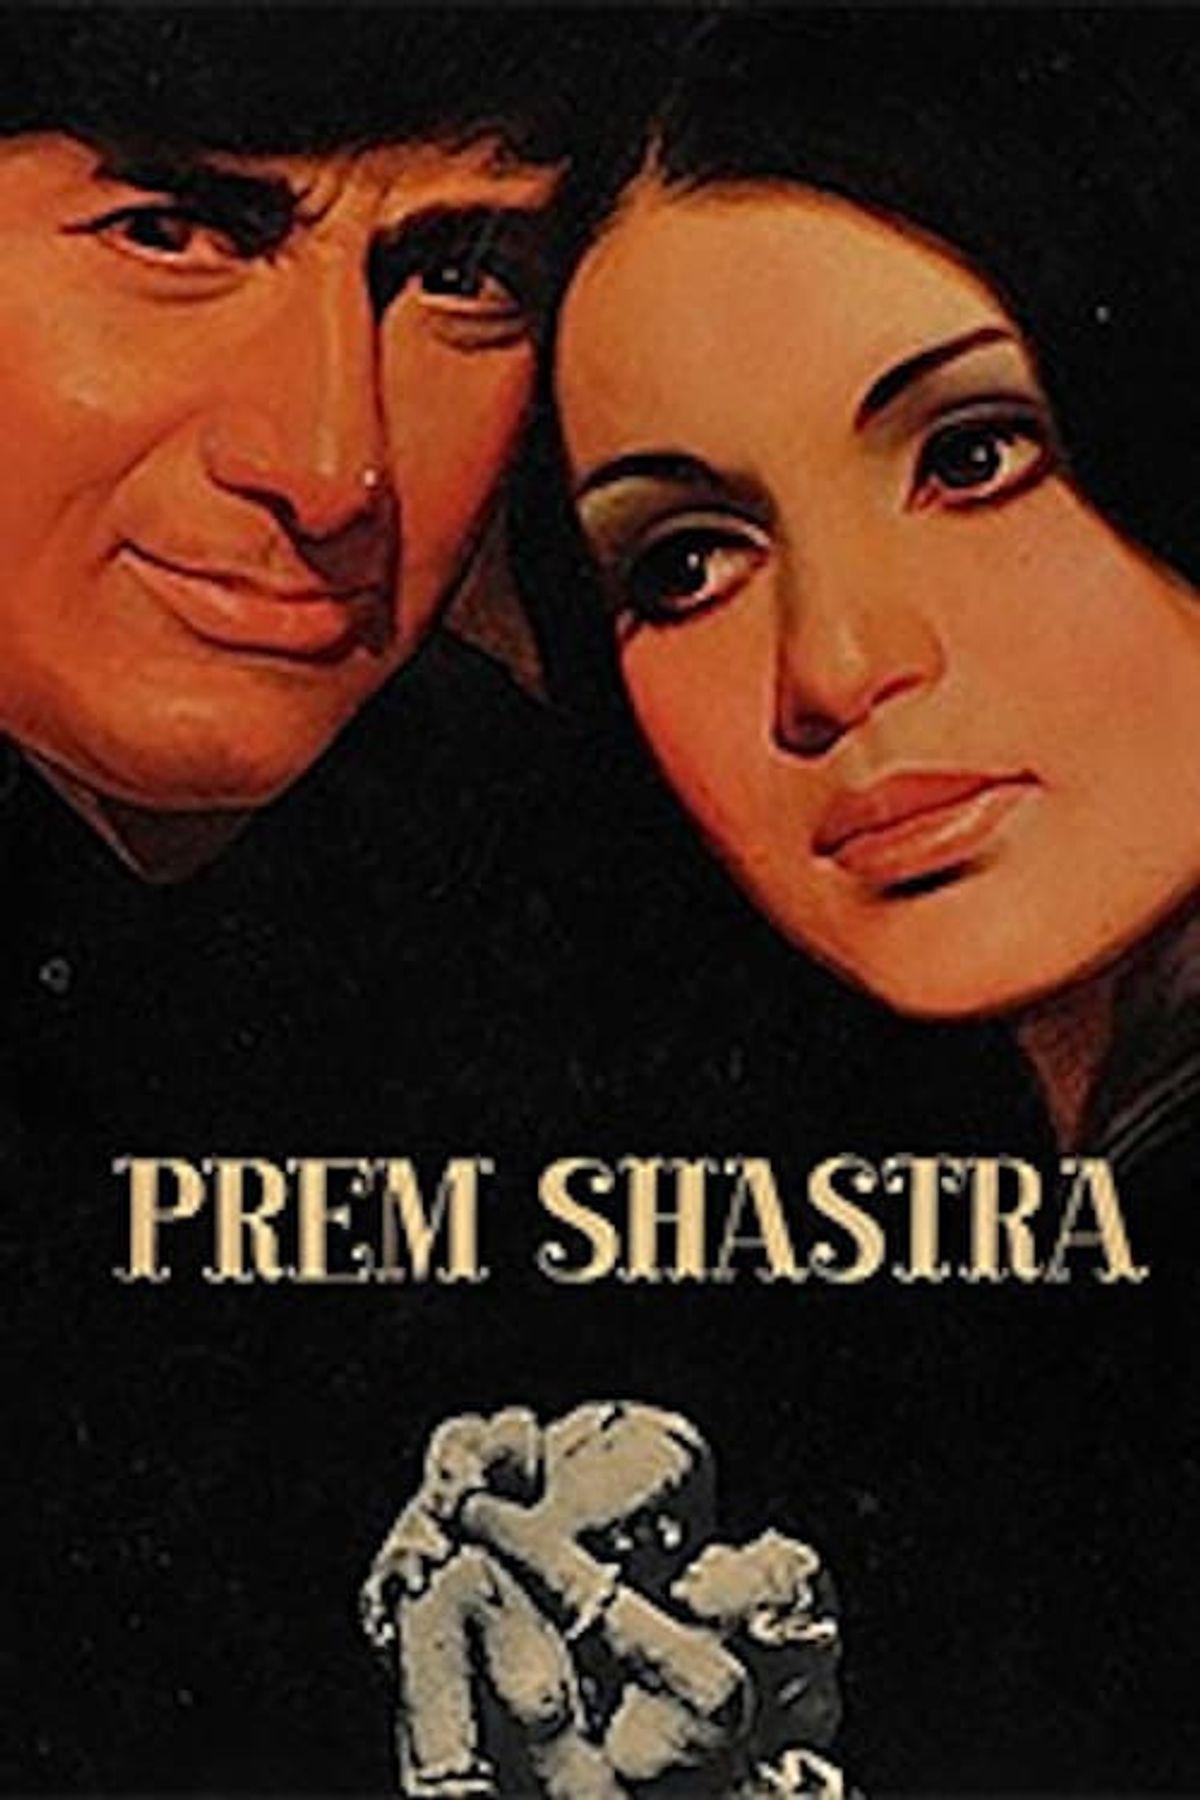 B R Ishara Best Movies, TV Shows and Web Series List